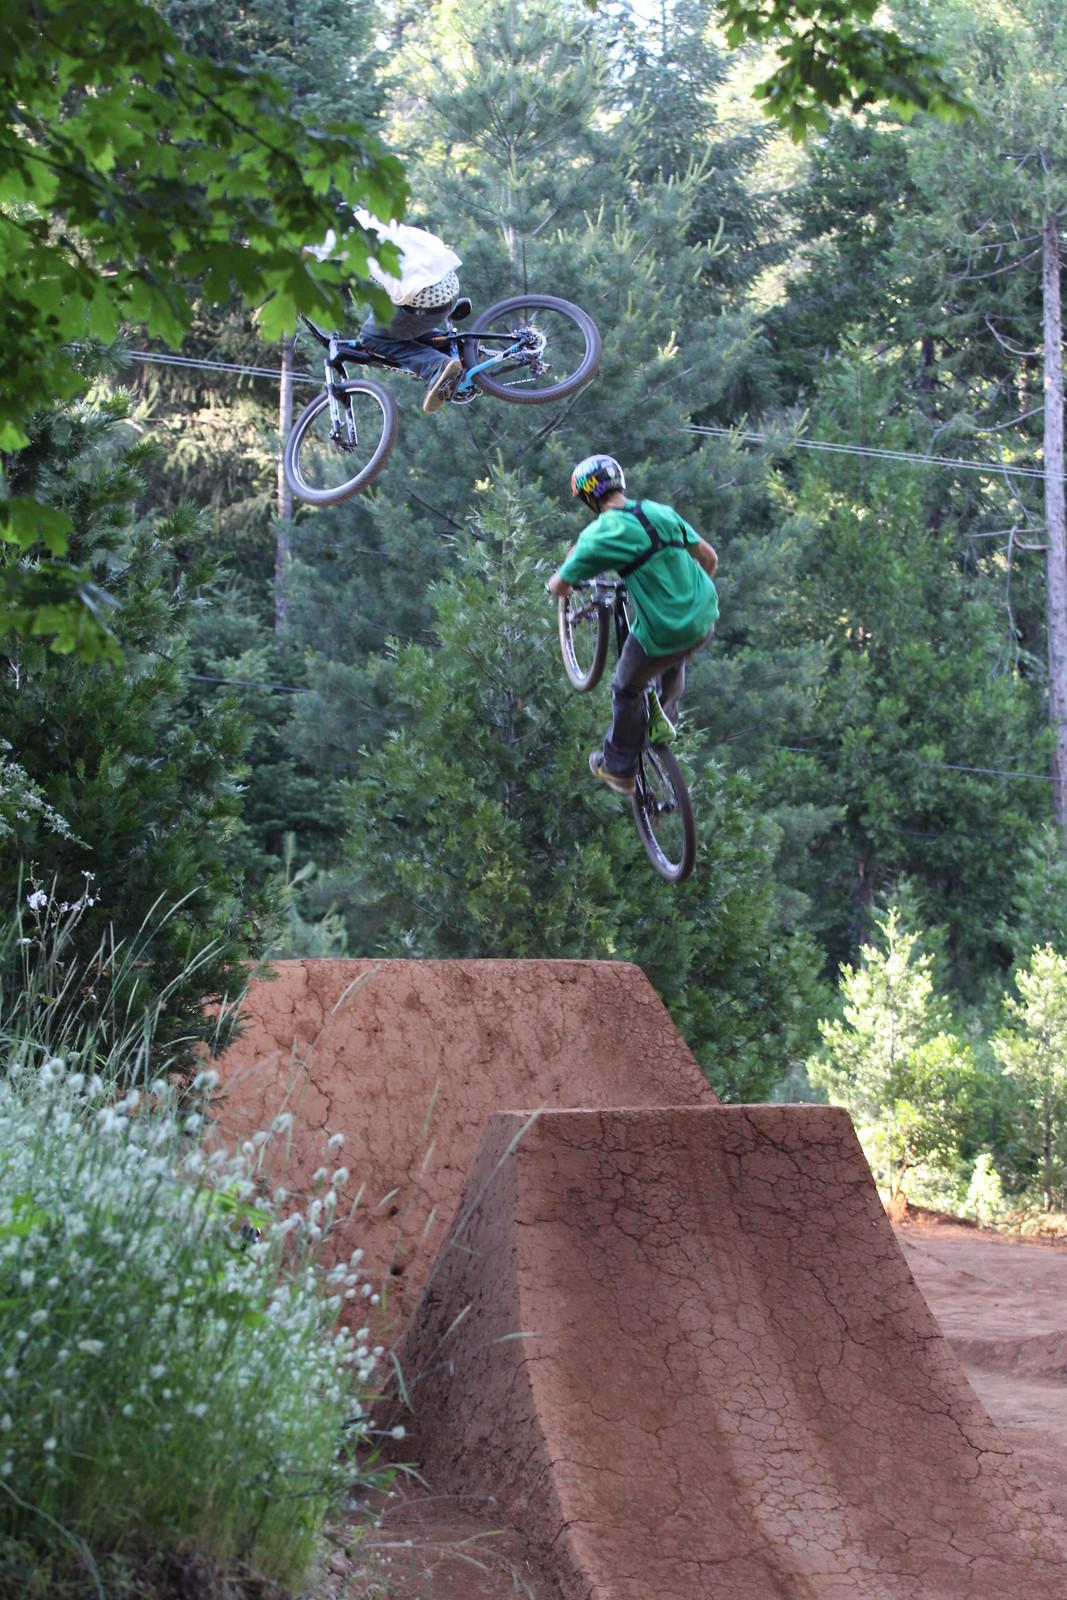 003 - ZD - Mountain Biking Pictures - Vital MTB